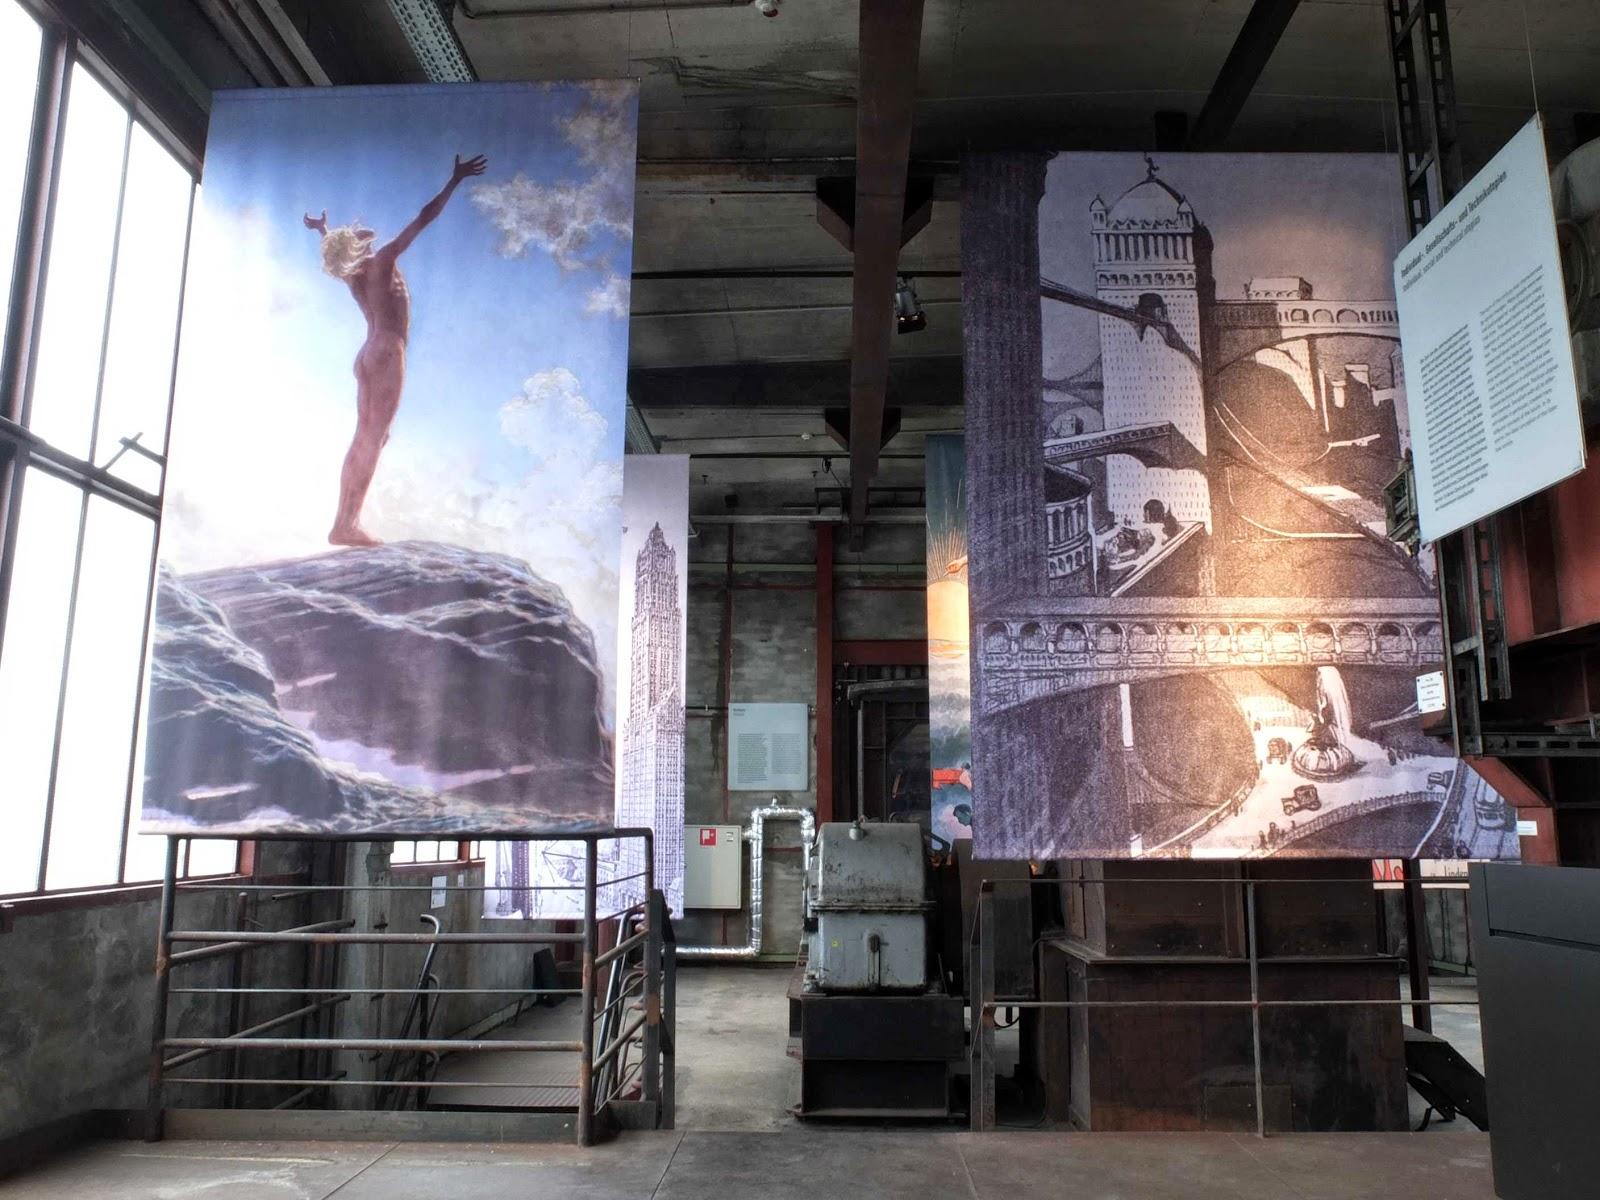 Reformbewegung, oberste Ebene, Standseilbahn, Prolog der Ausstellung